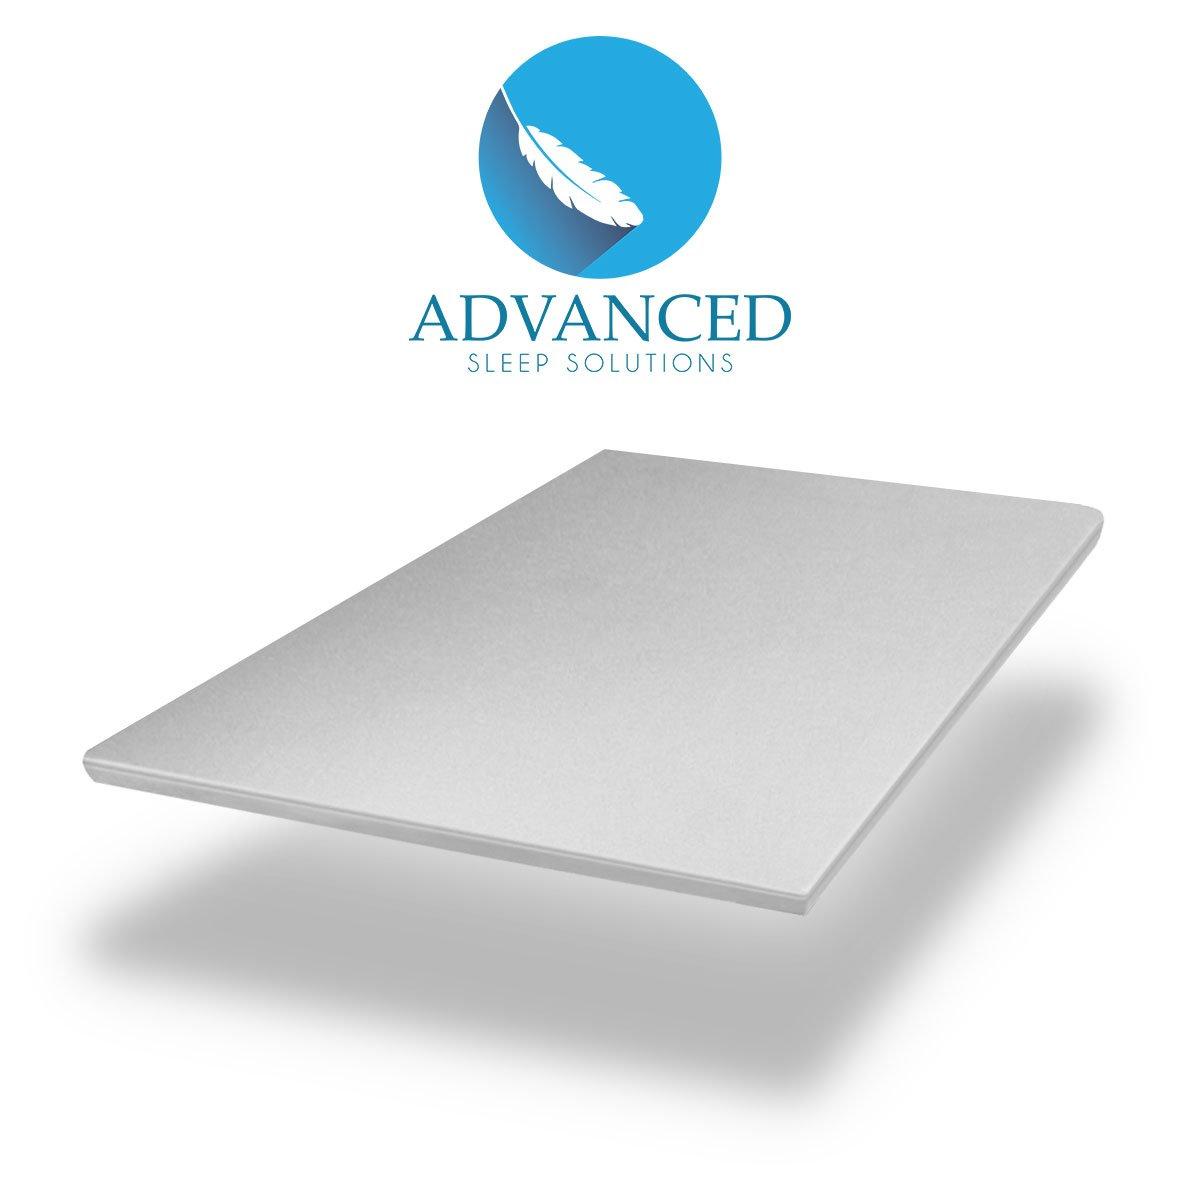 amazon com advanced sleep solutions memory foam mattress topper 2